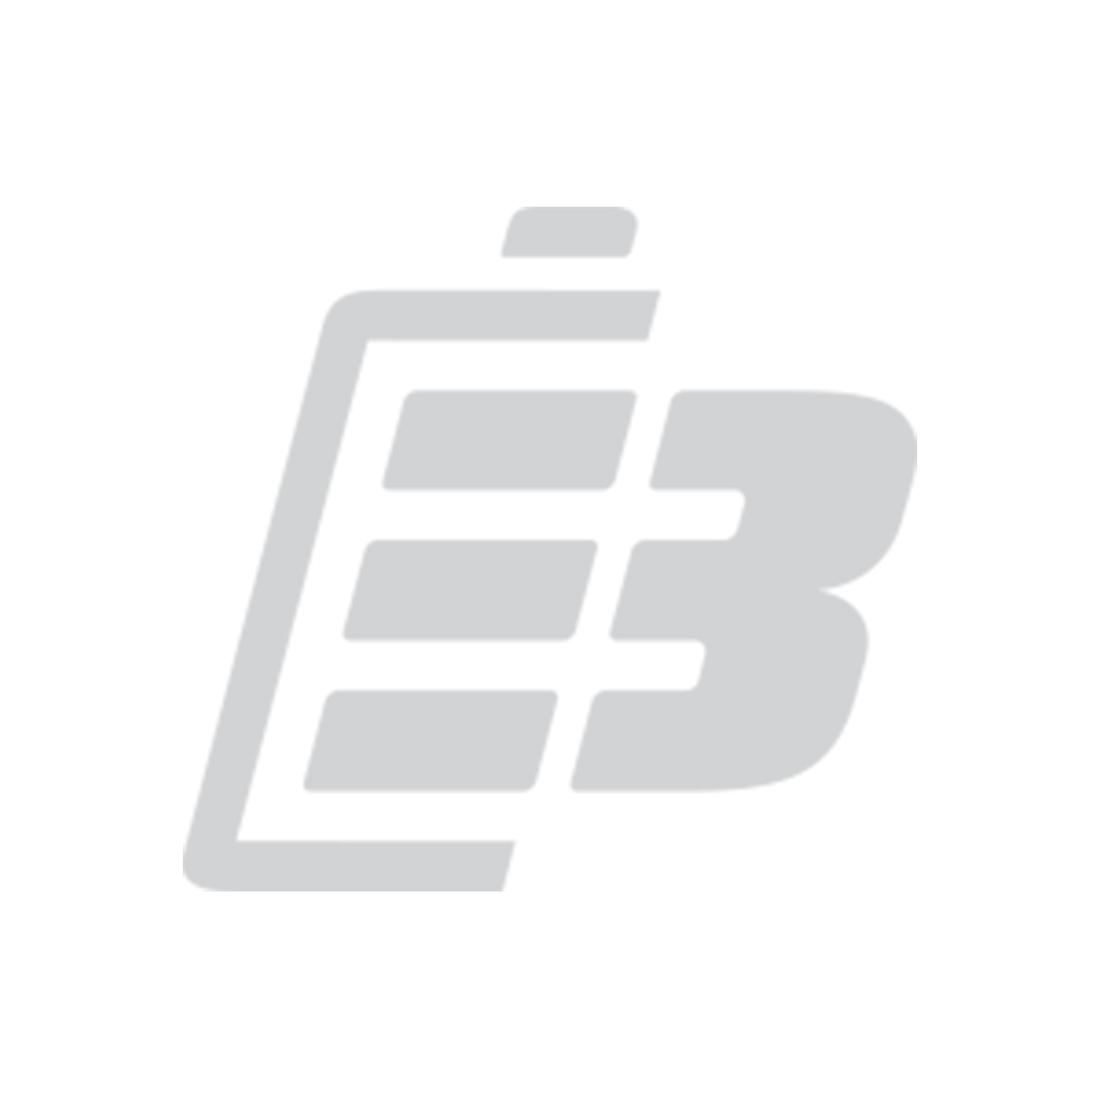 Multipower Lead Acid Battery 6V 2.8Ah